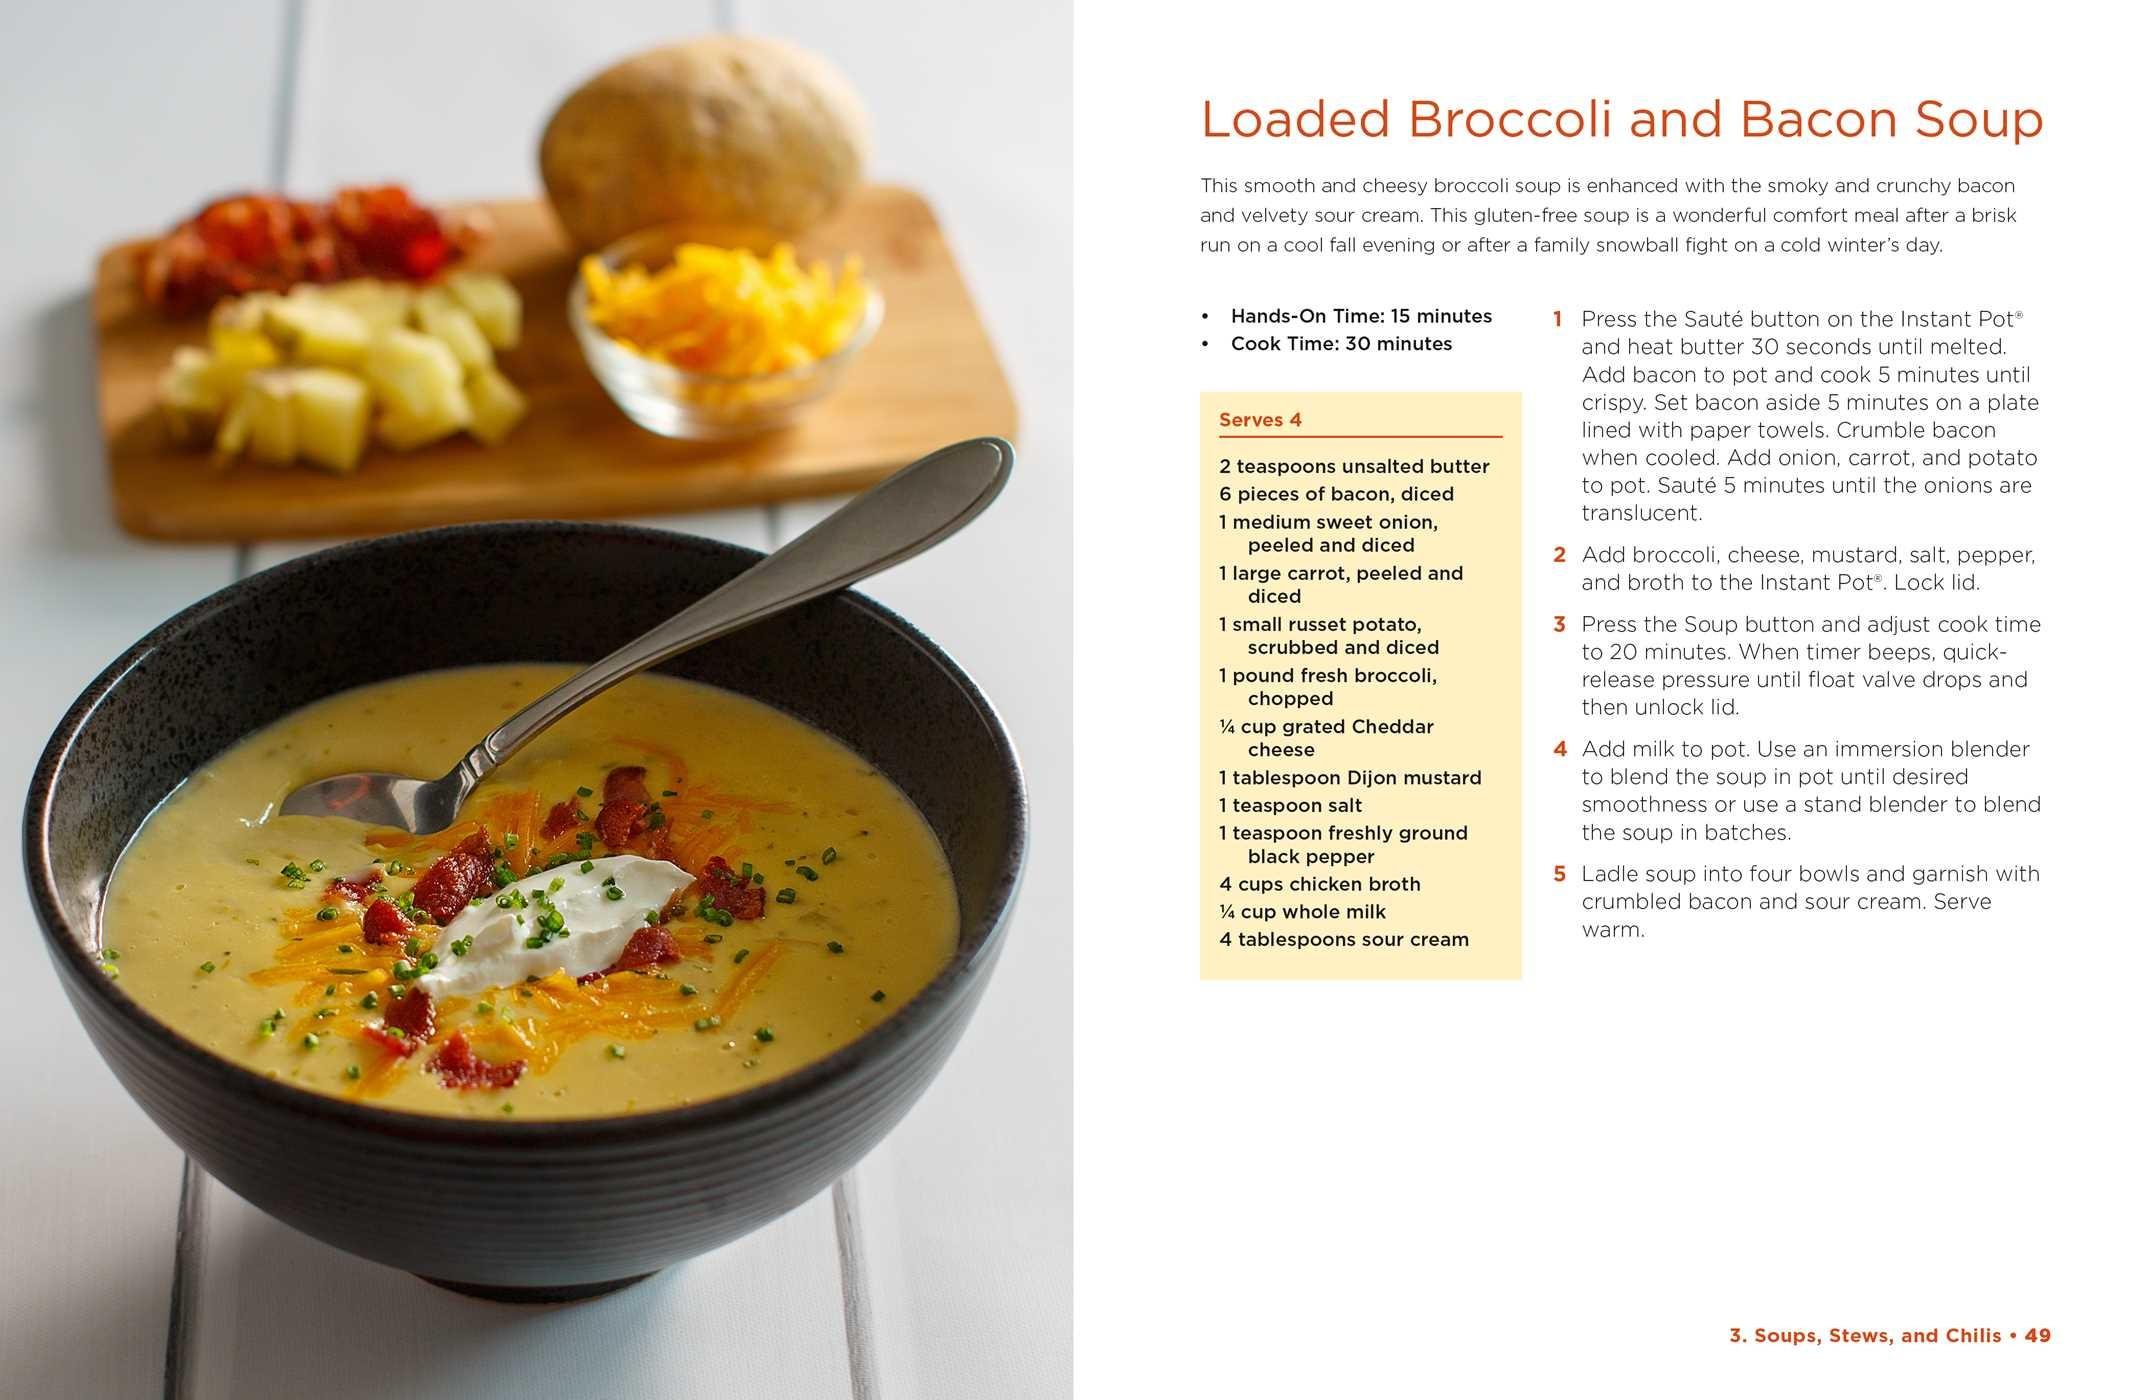 The i love my instant pot gluten free recipe book 9781507208717.in01